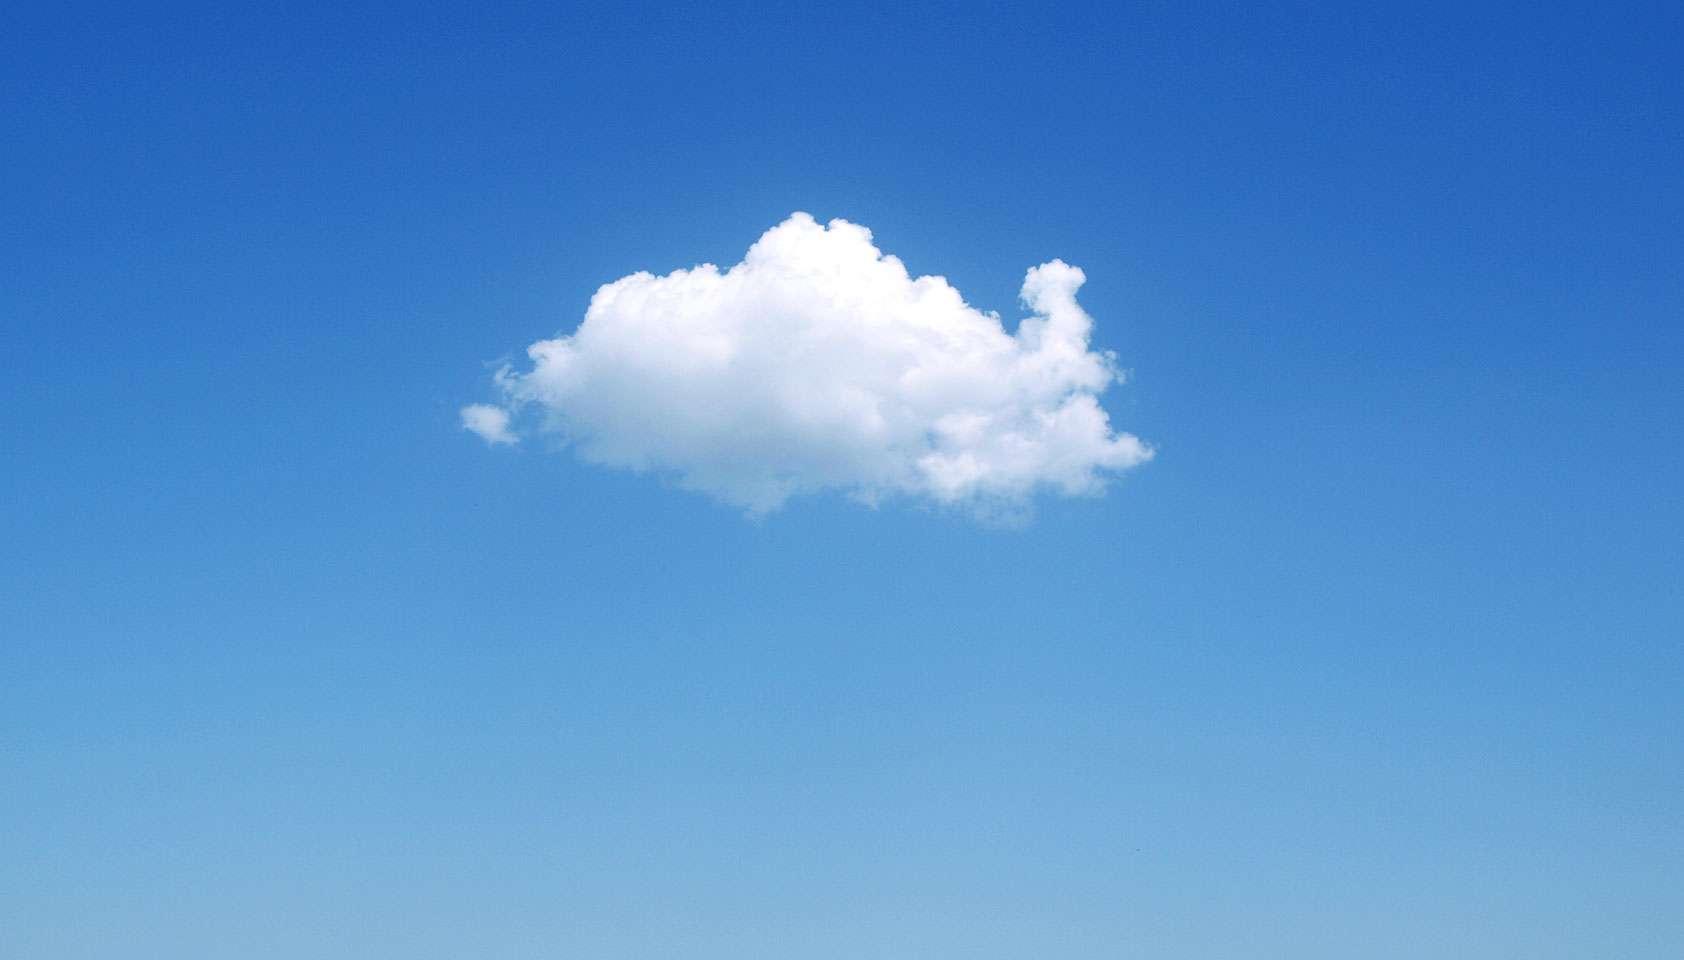 HQ Cloud Wallpapers   File 49.29Kb